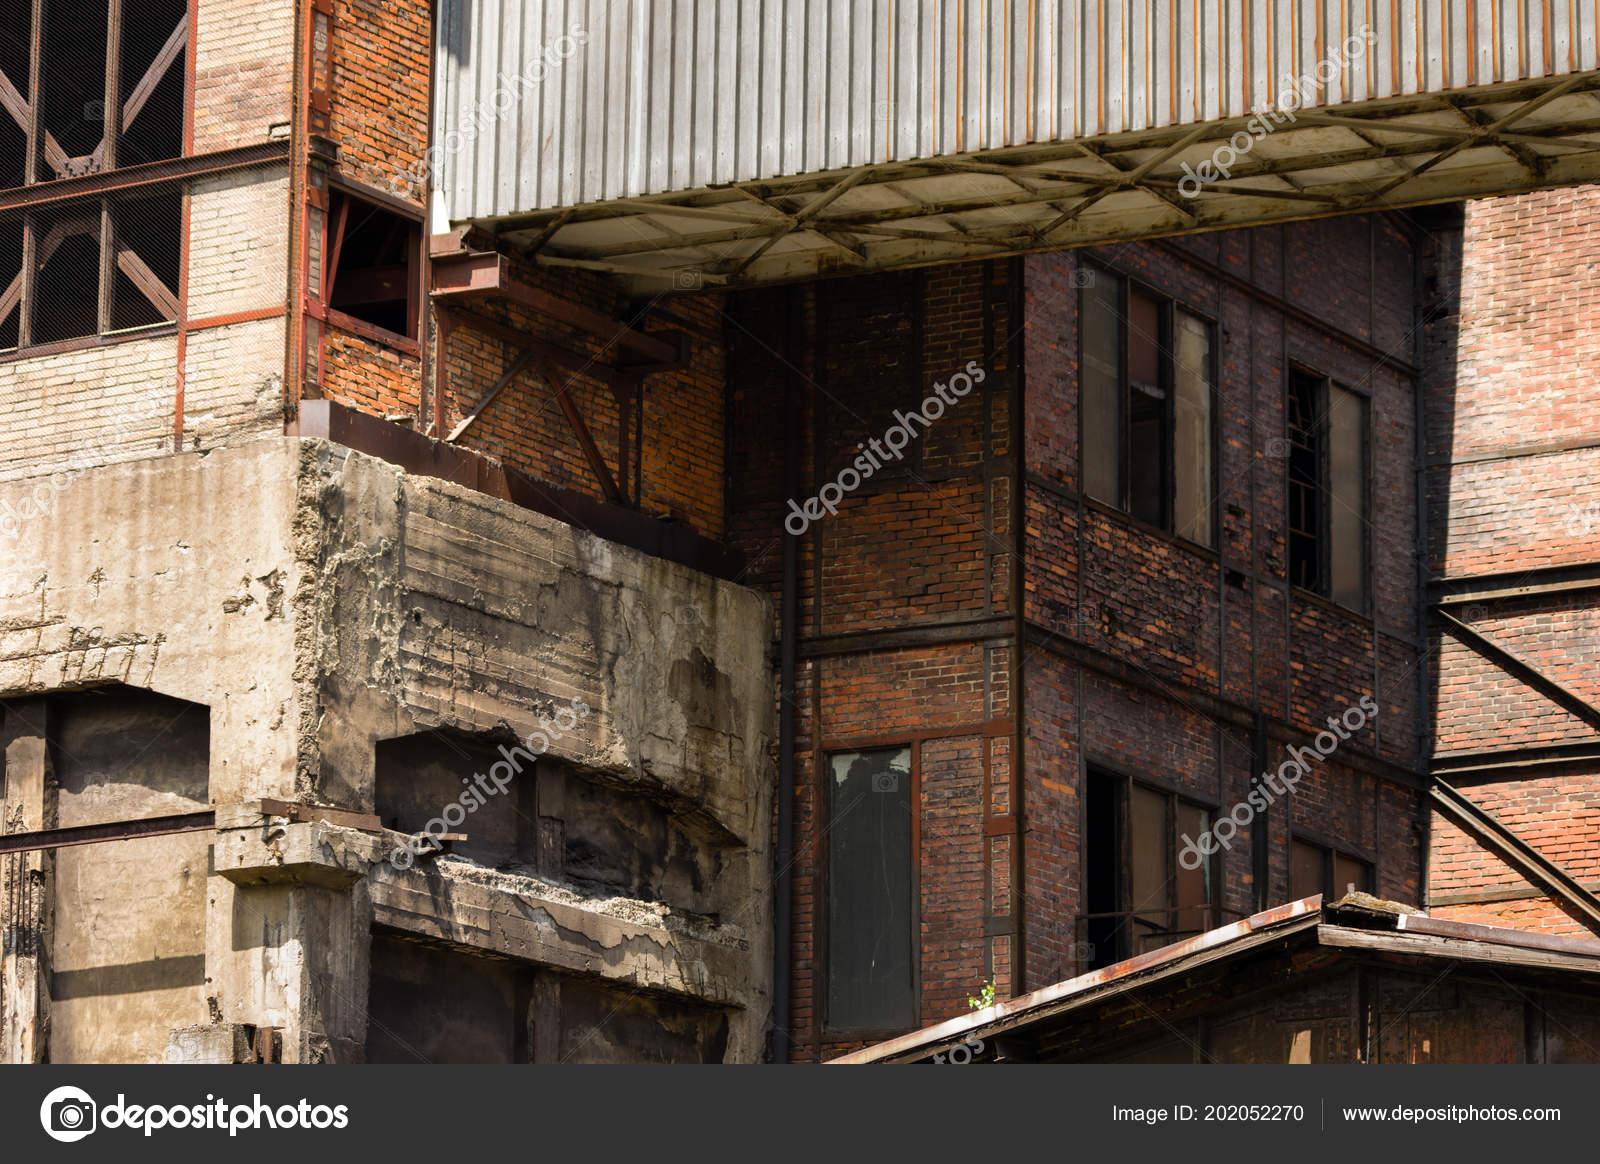 Abandoned Buildings Dolni Vitkovice Industrial Area Ostrava Czech Republic Stock Photo C Vidumg 202052270